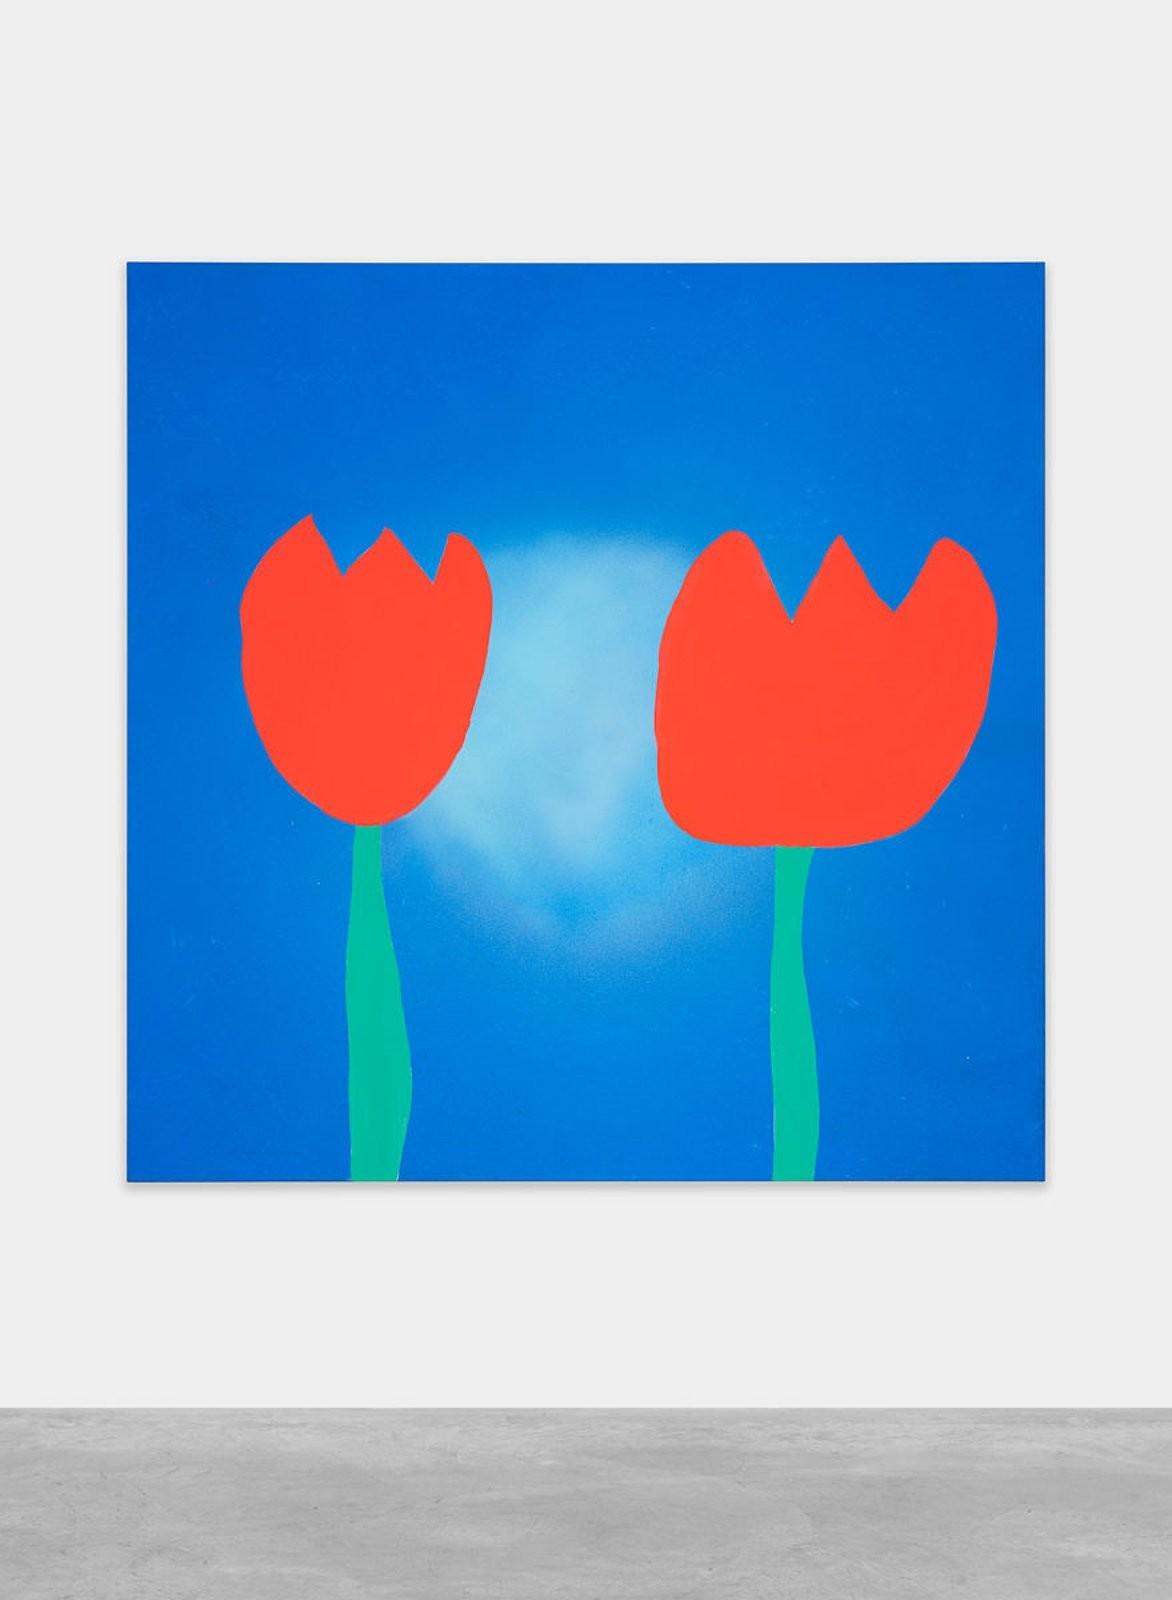 018_al14526-tulips-2018-hires-879x1200.jpg